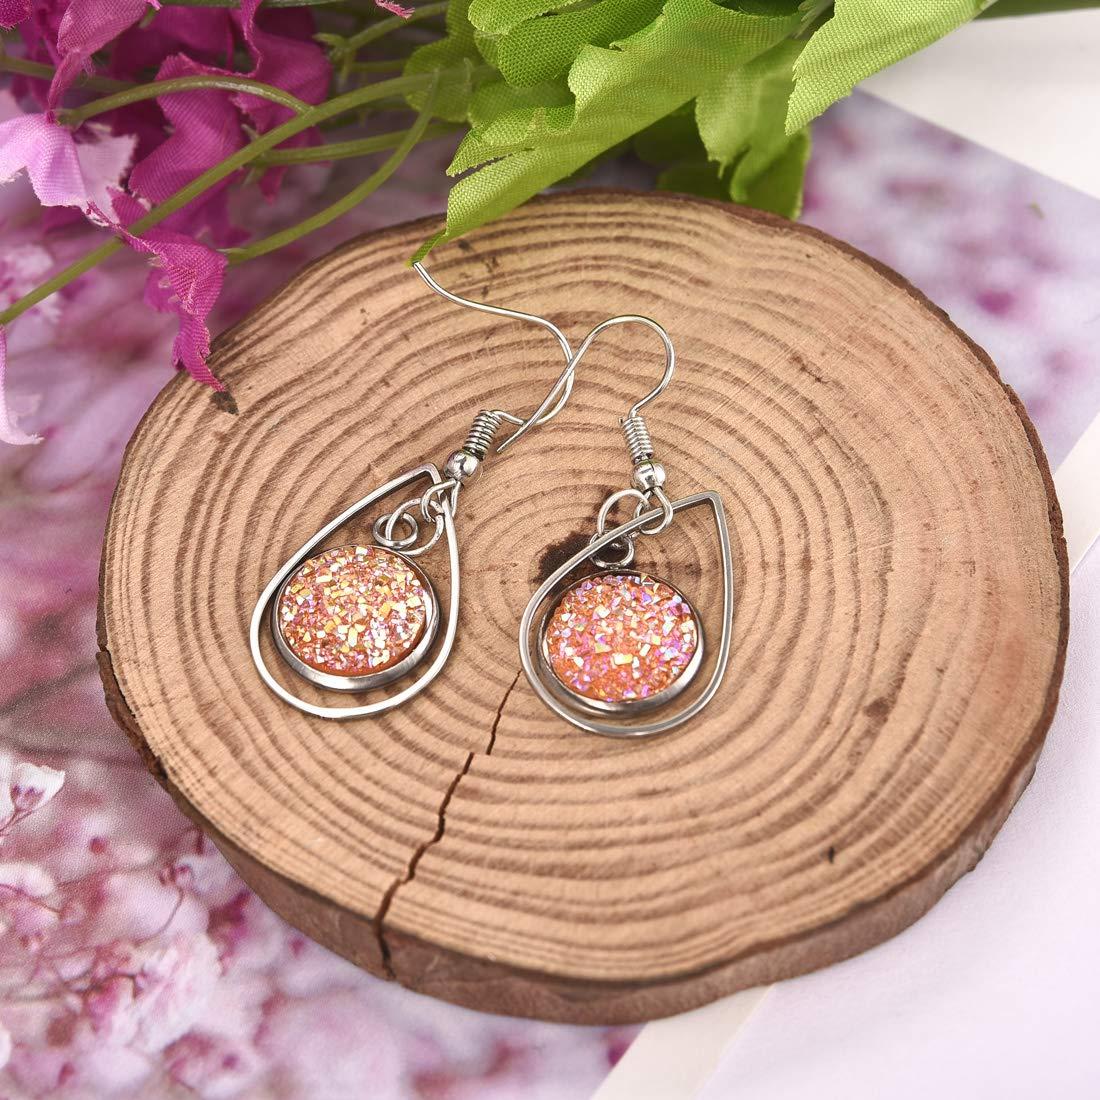 LANBEIDE Earring Blanks Wire Hooks Bezel Trays for 12mm Cabochon Settings Mixed 28 PCS Stainless Steel Earring Dangle for Jewelry Findings